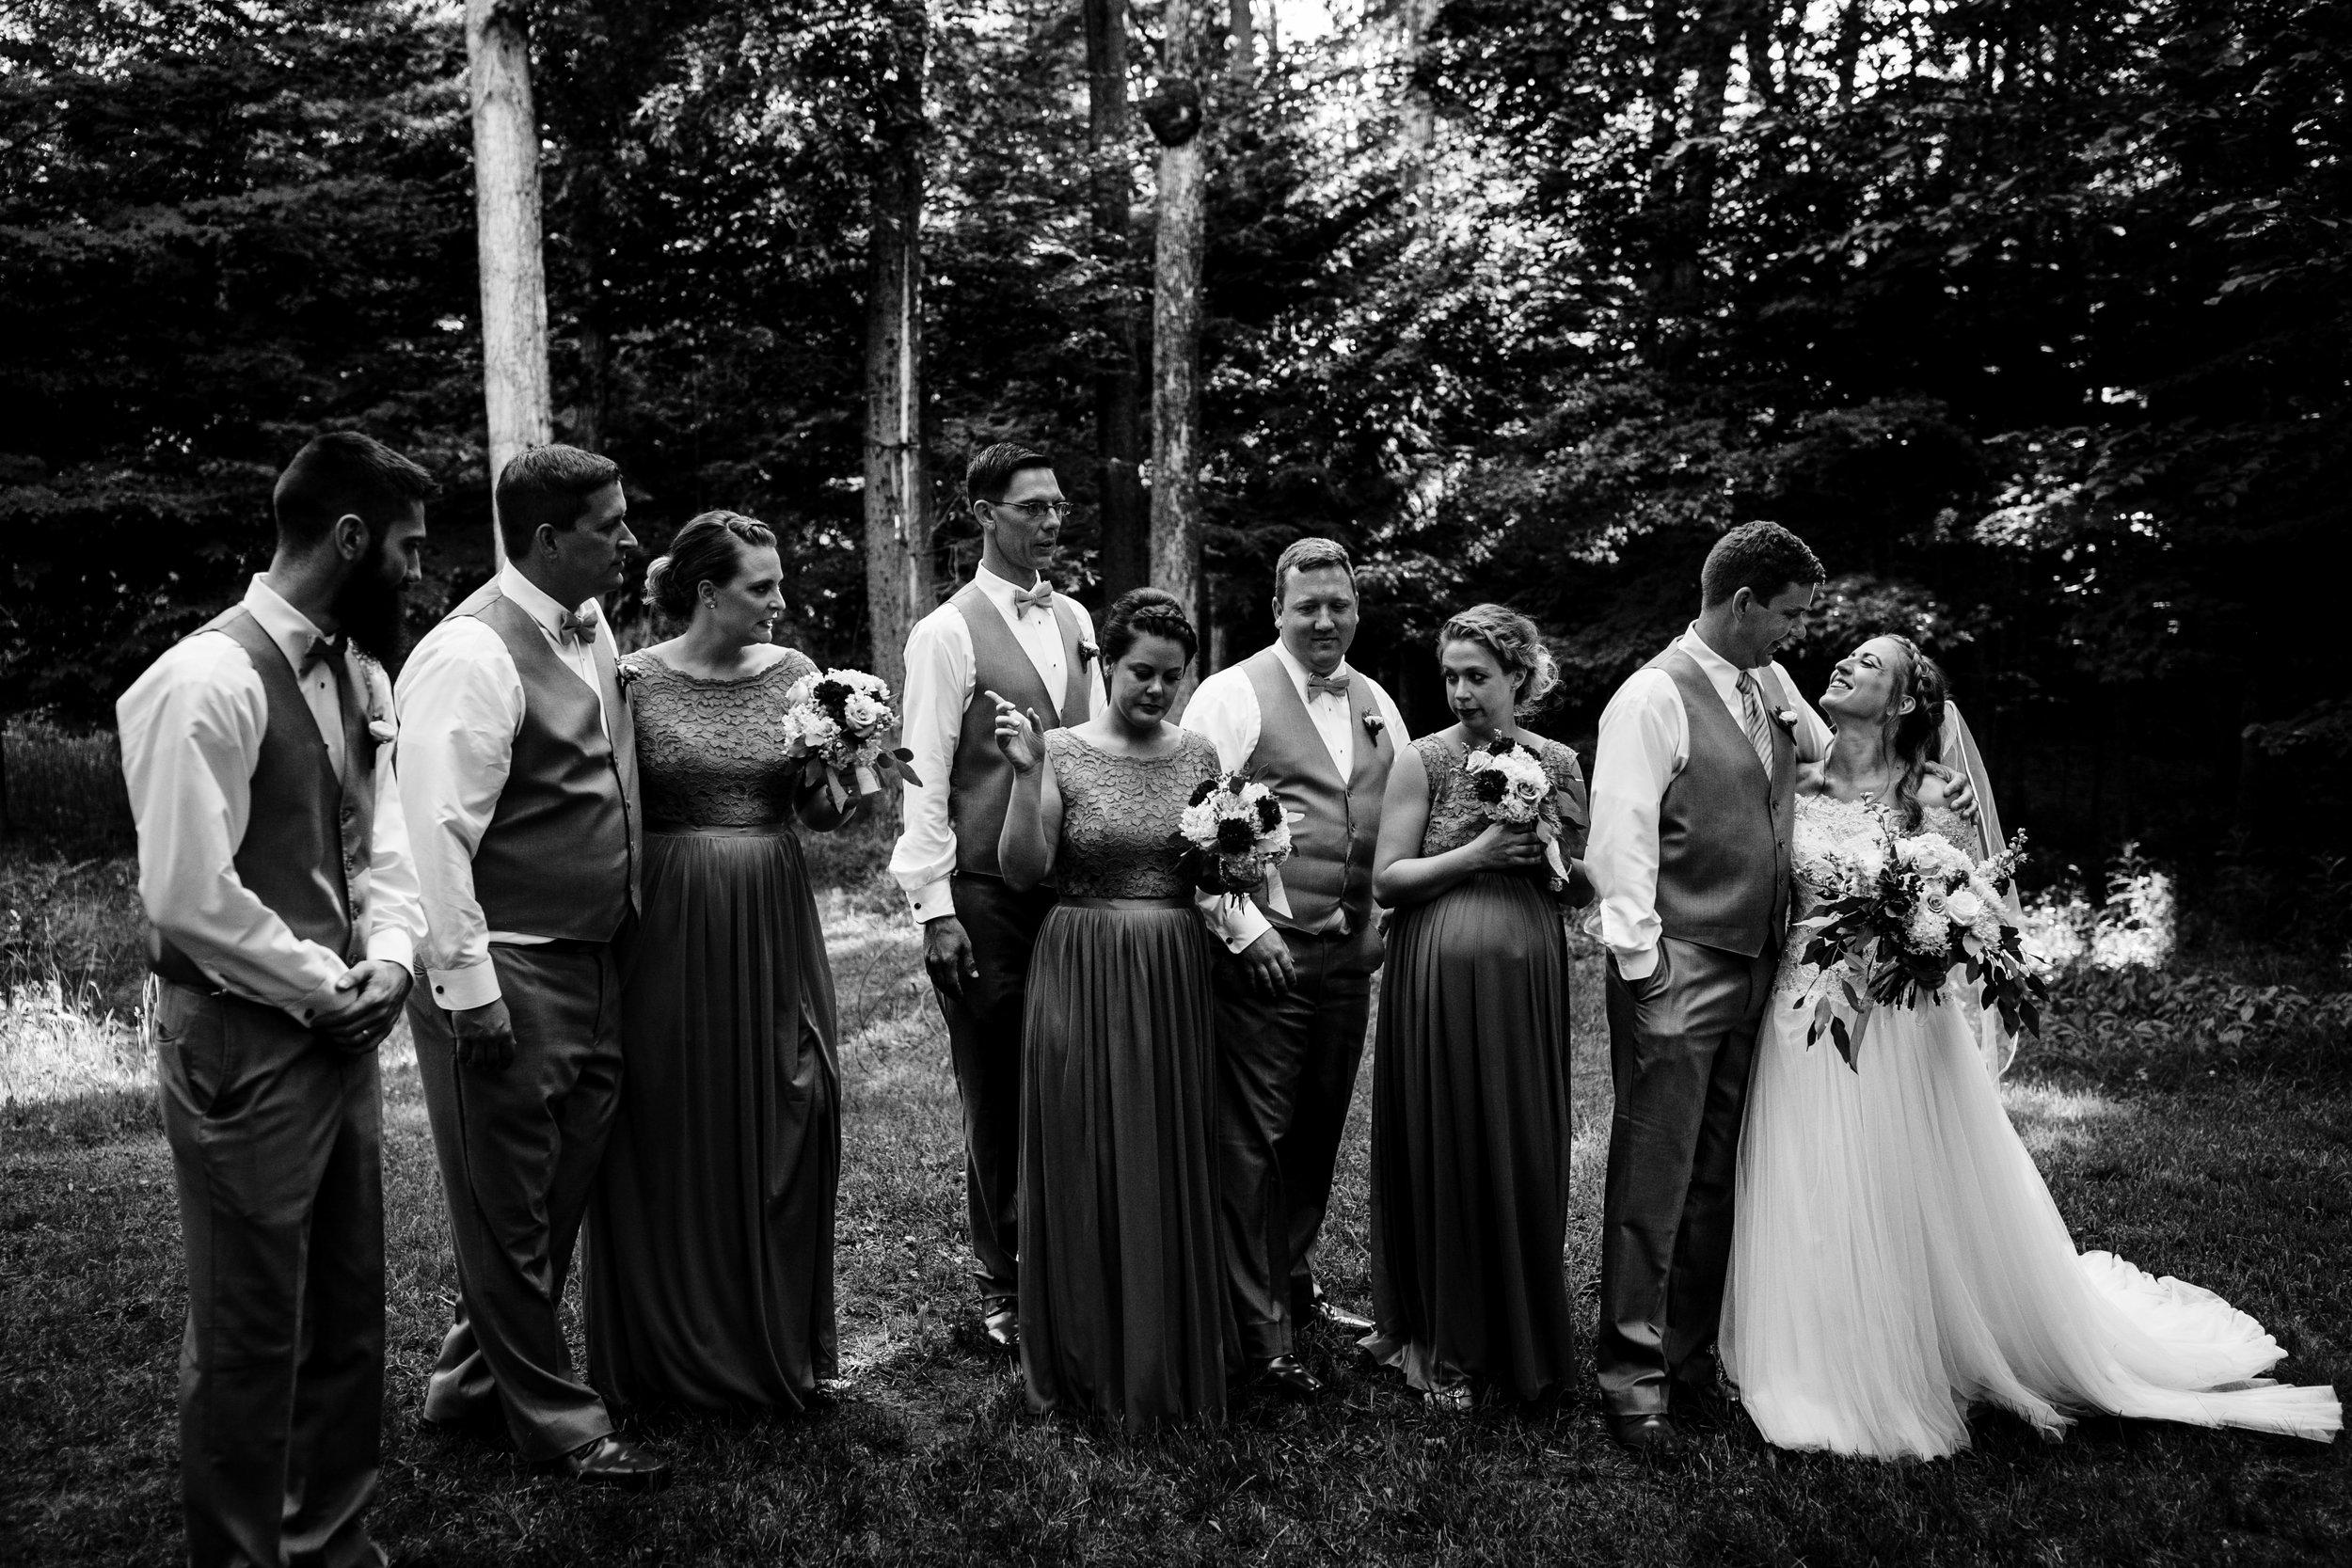 ludington-michigan-intimate-backyard-wedding-jessica-nolan308.jpg